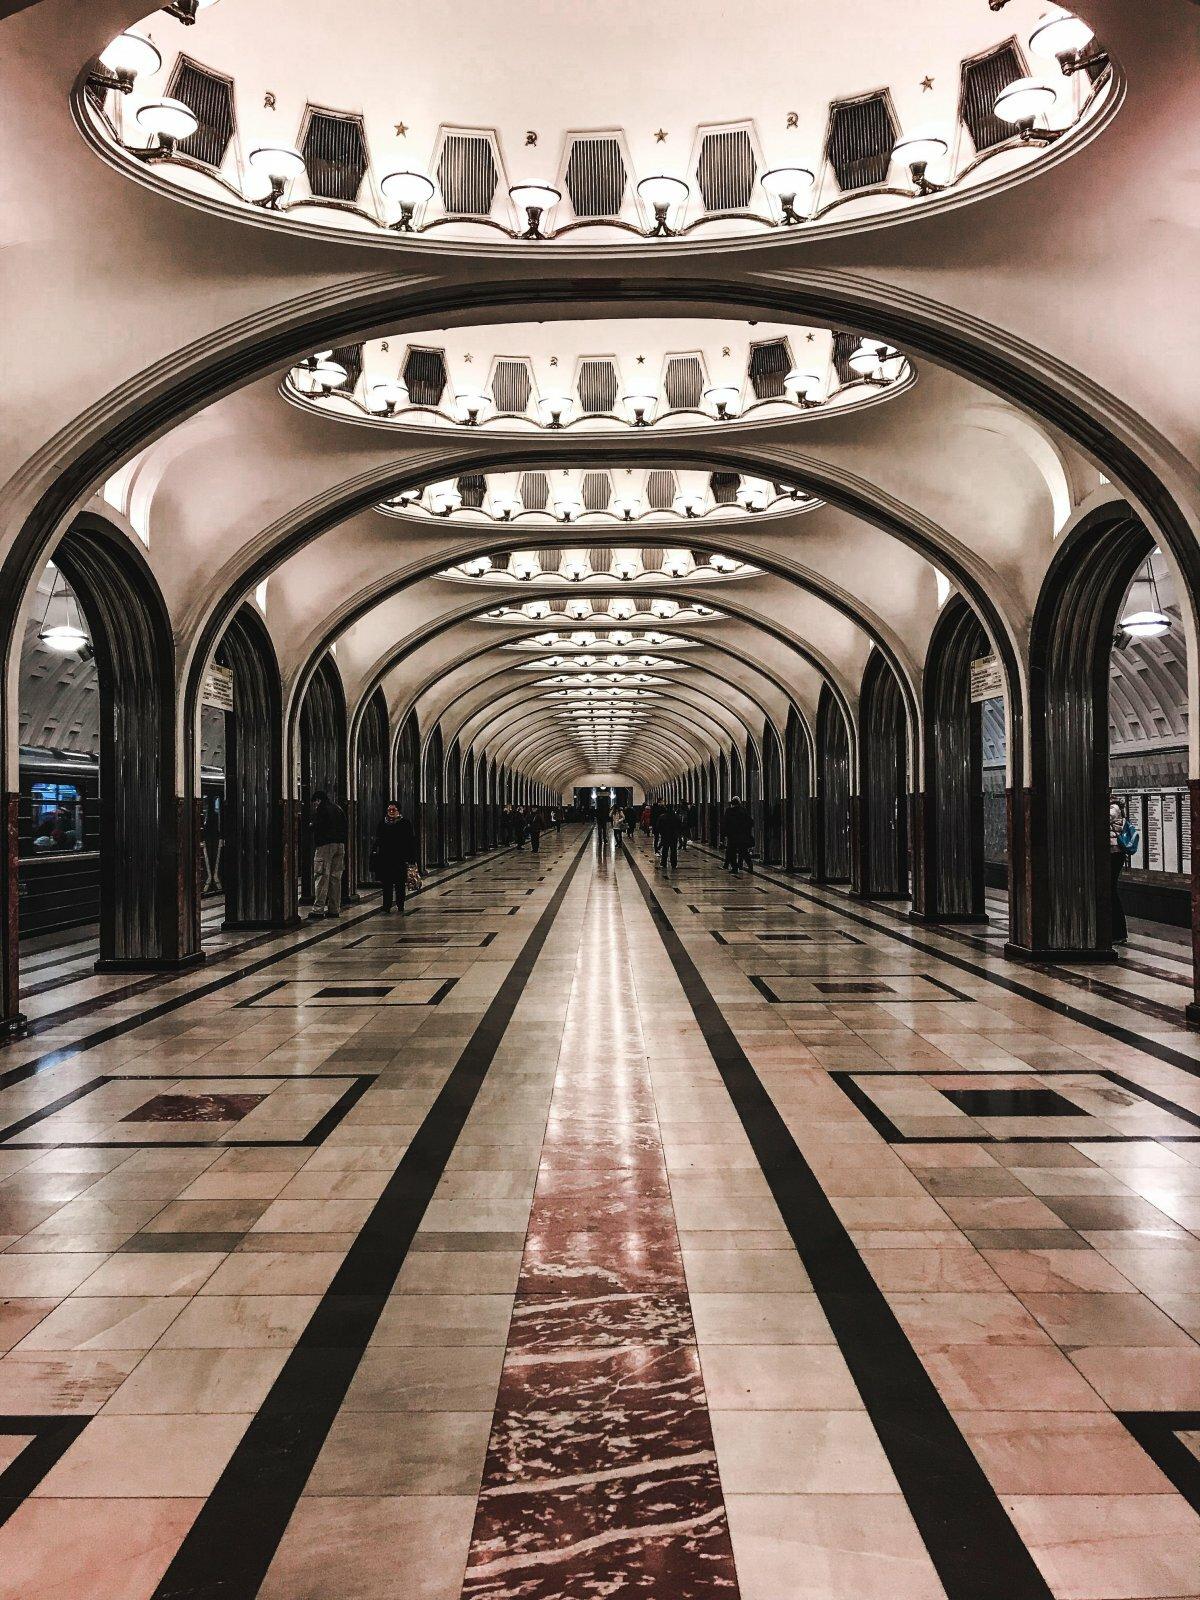 Картинки метро станция московская